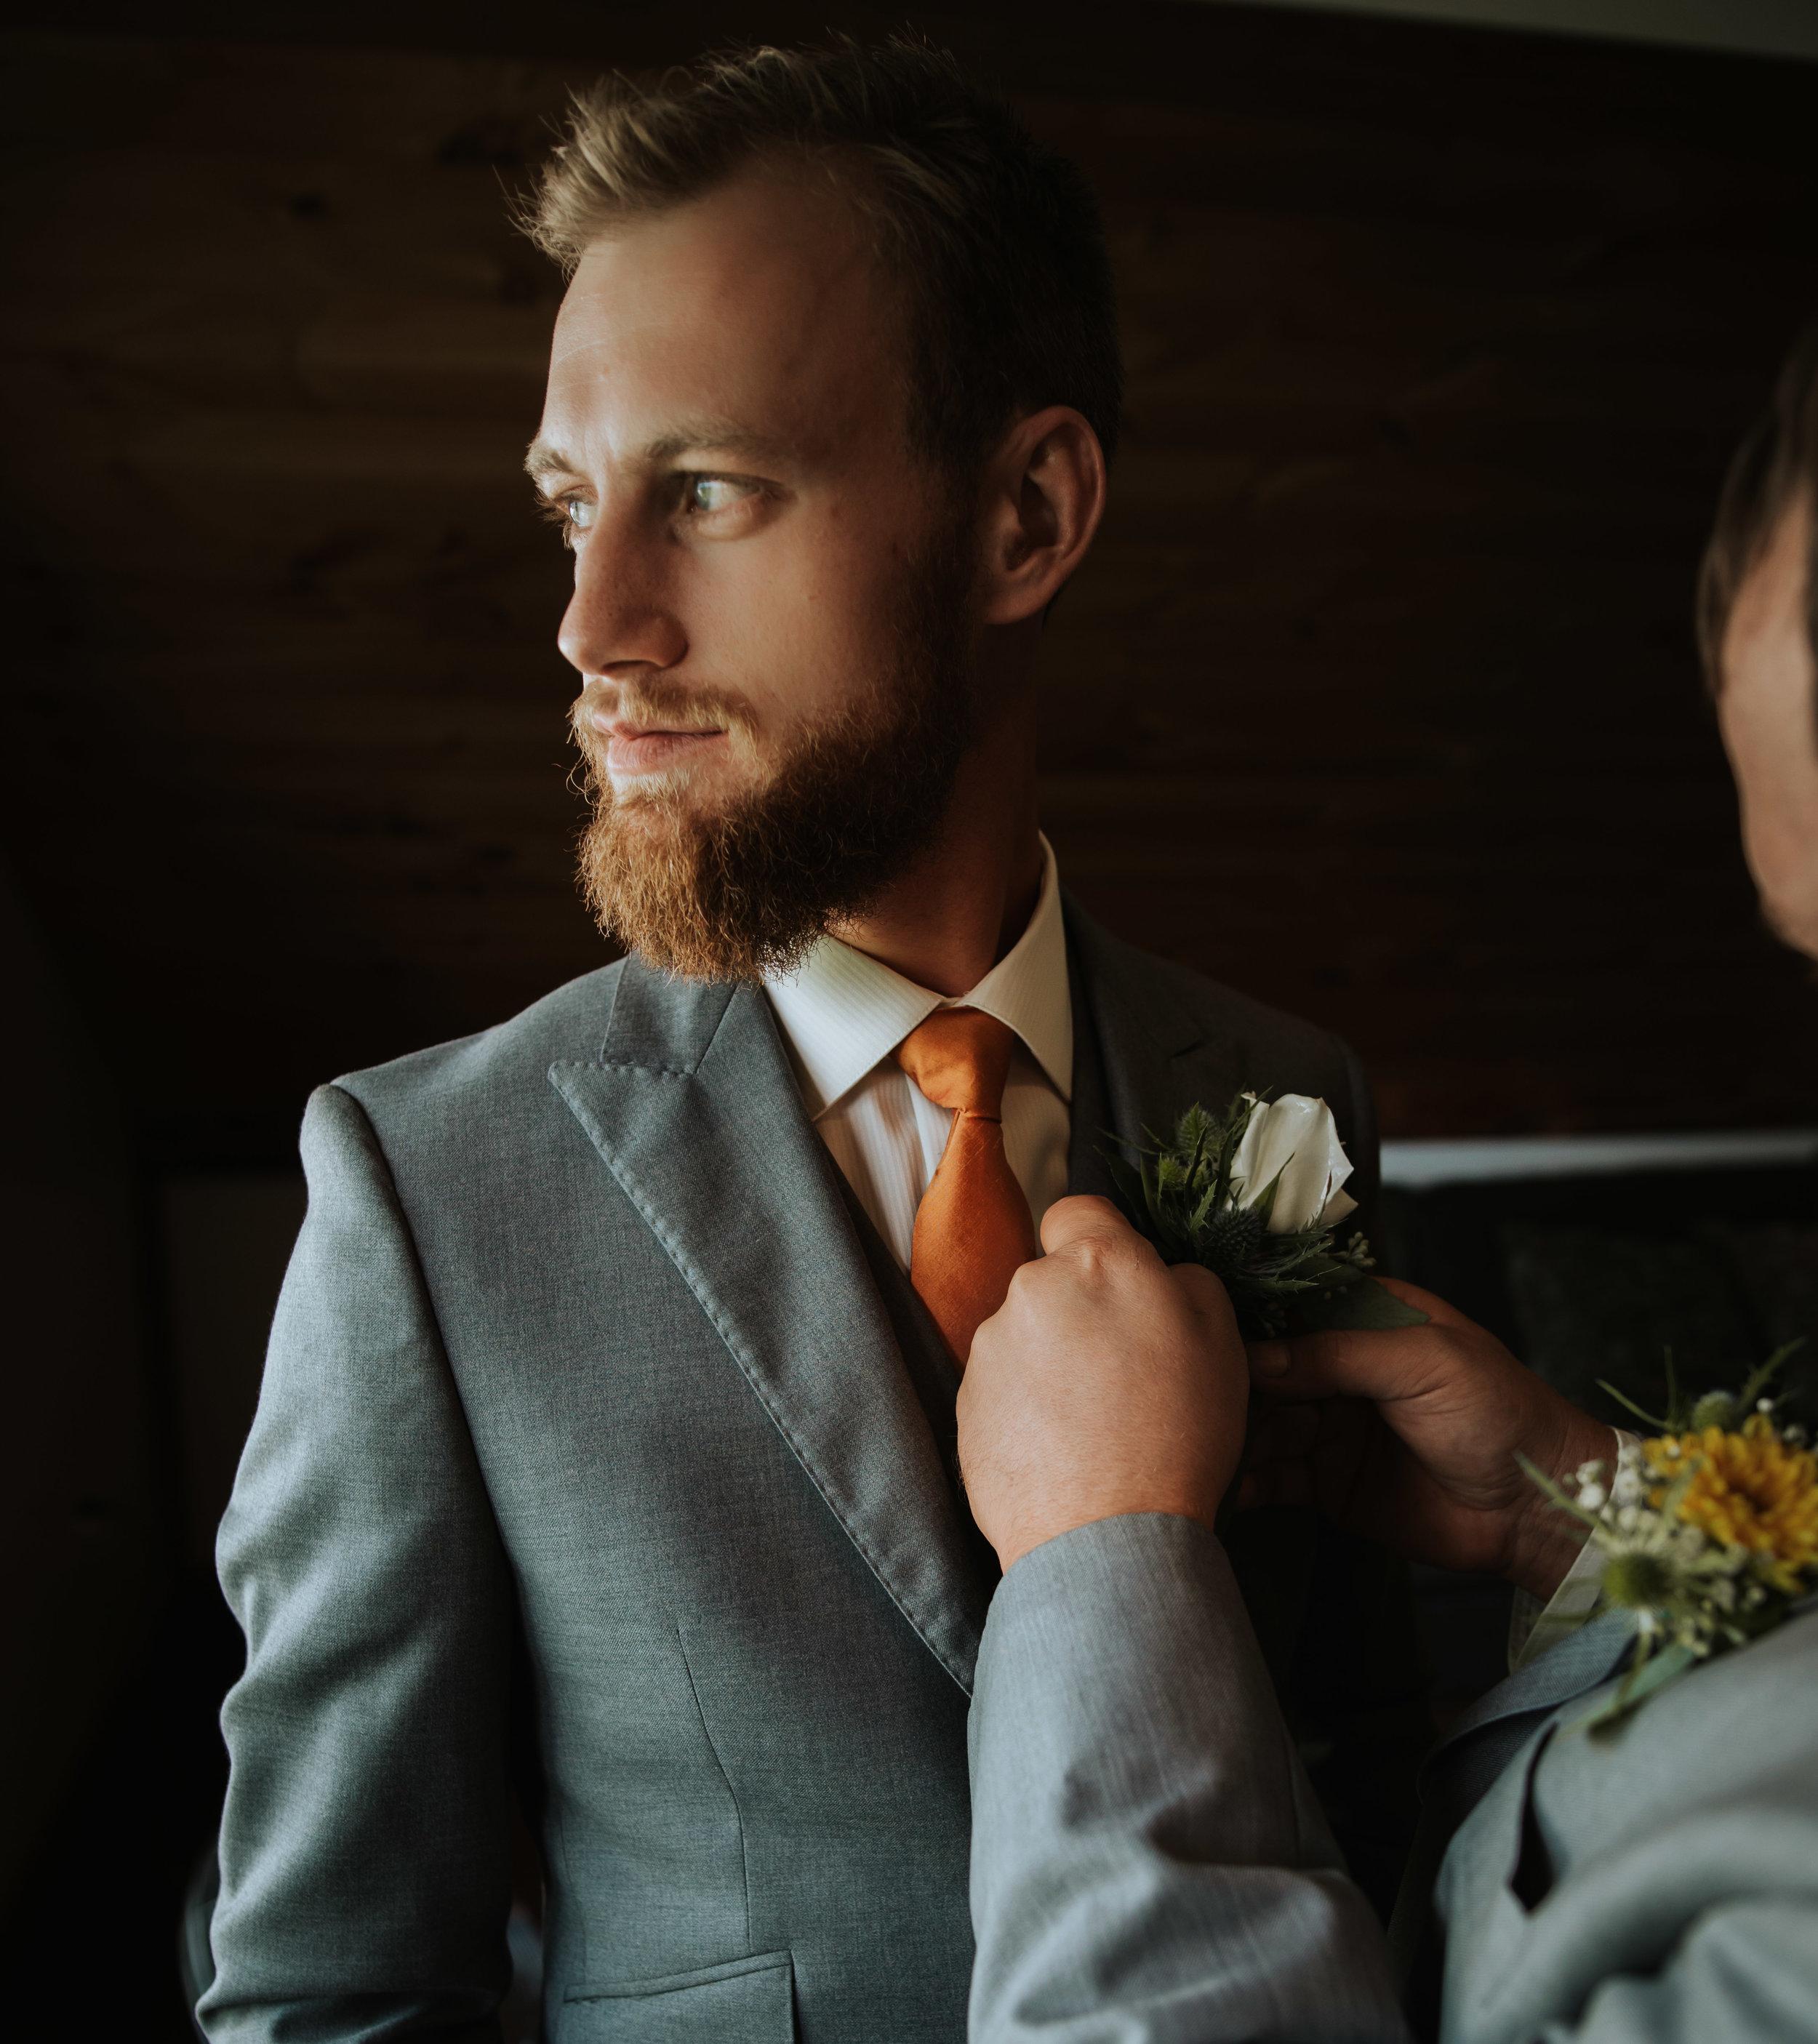 Vermont Wedding | Lorianna Weathers Photography-0307.jpg